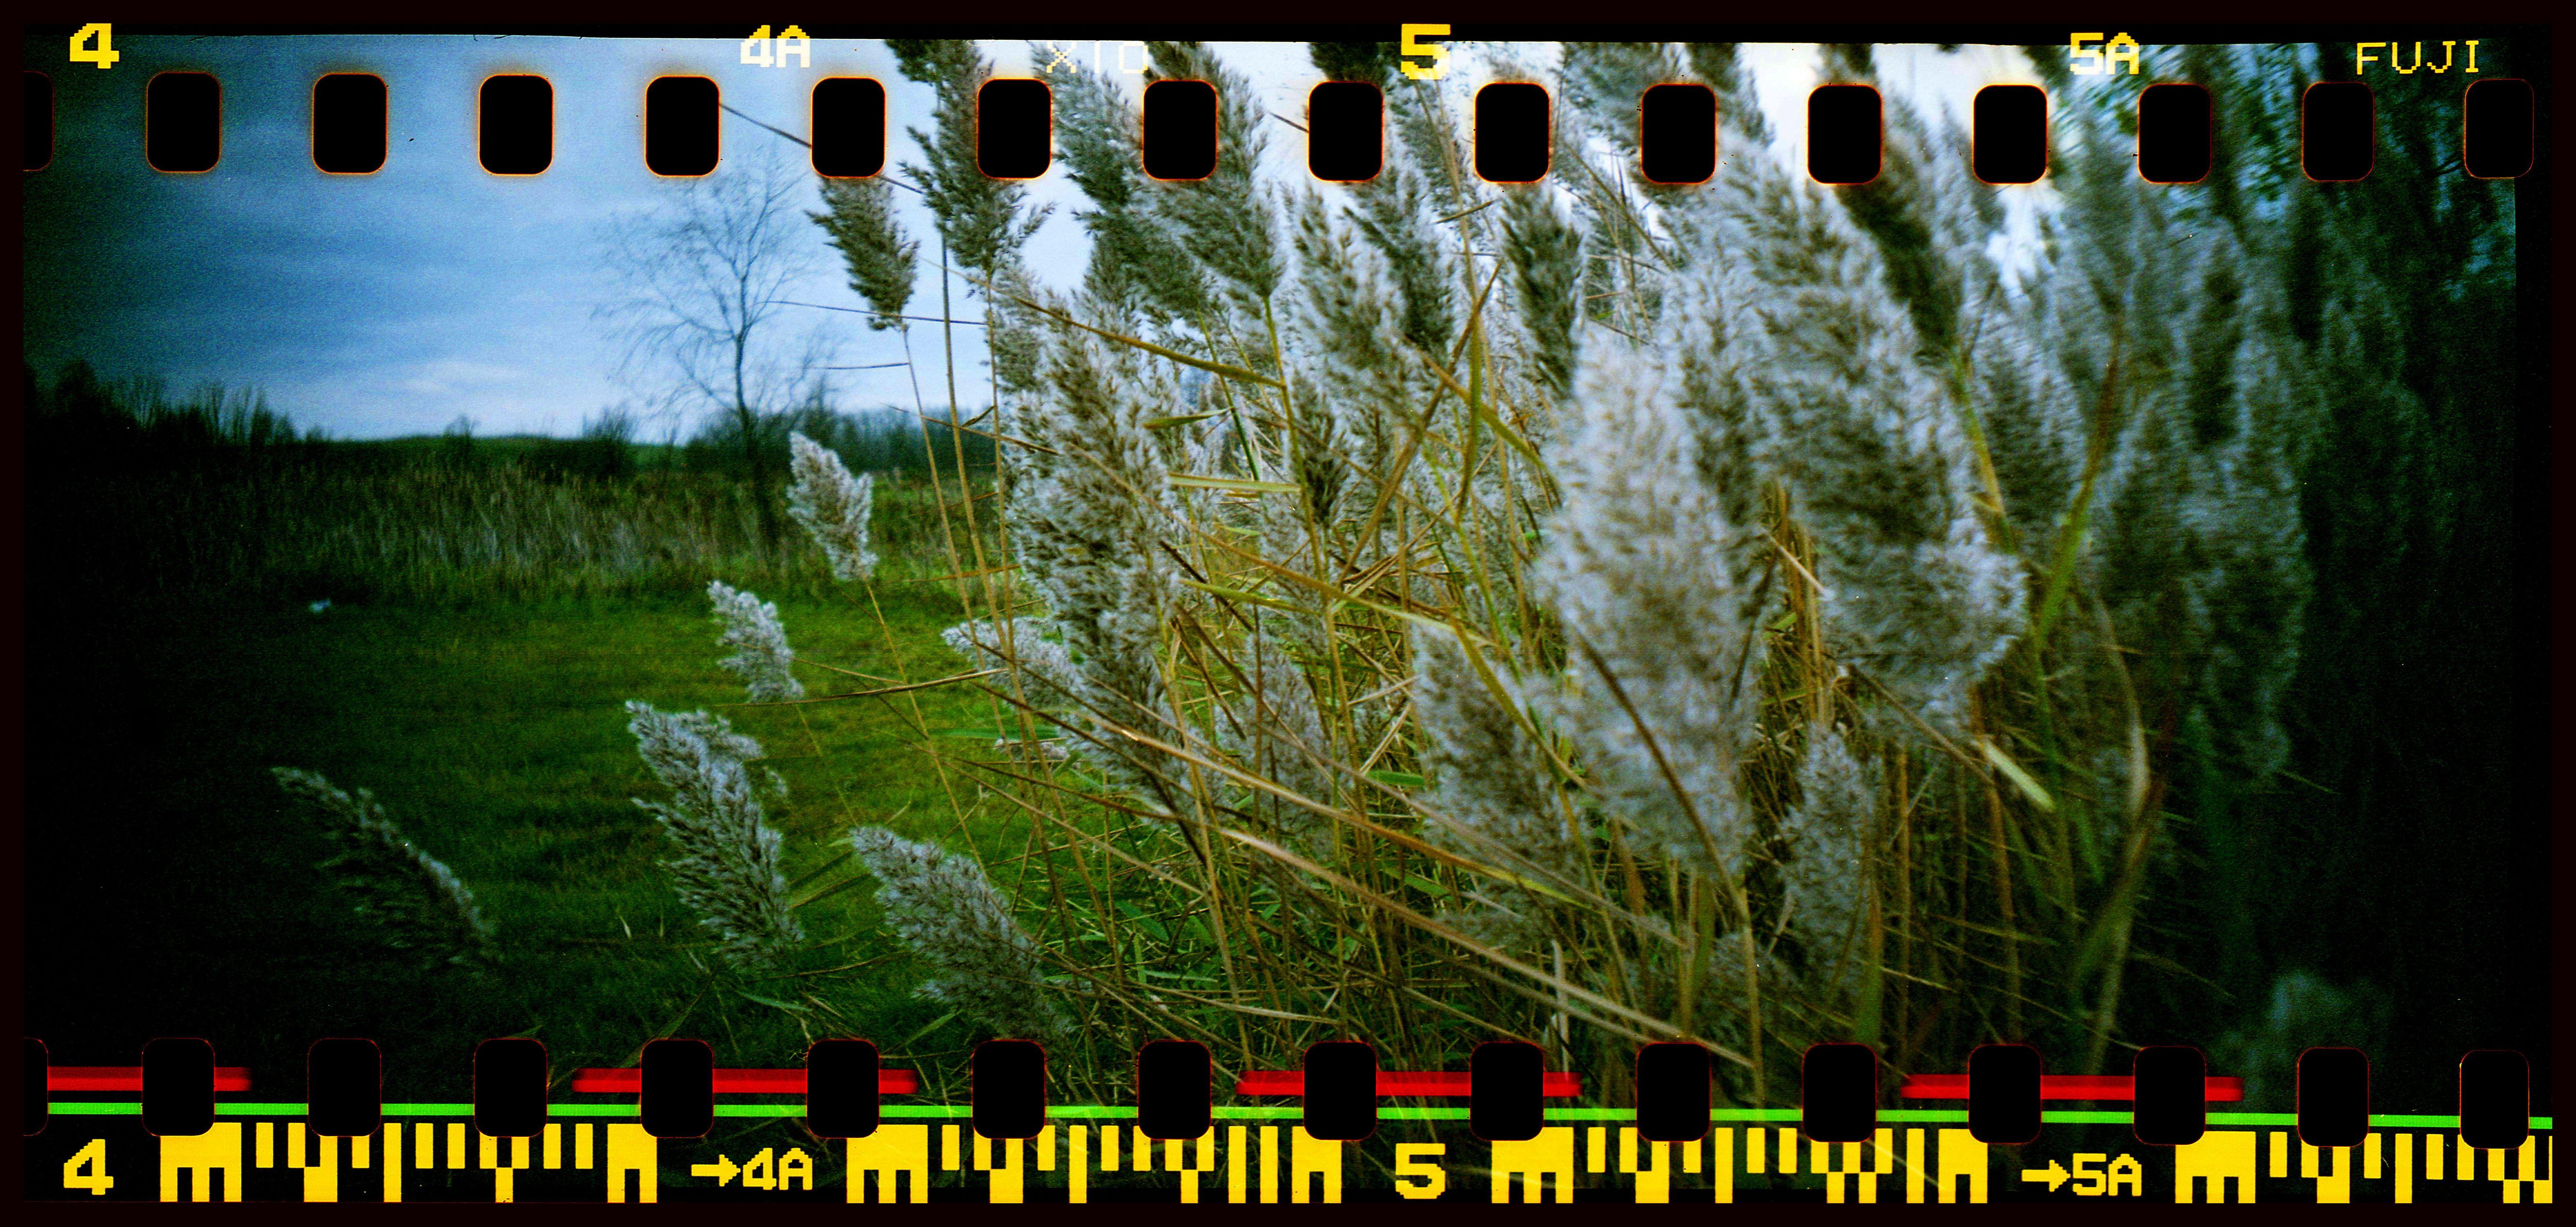 Midwestern Foliage, Fort Wayne, IN